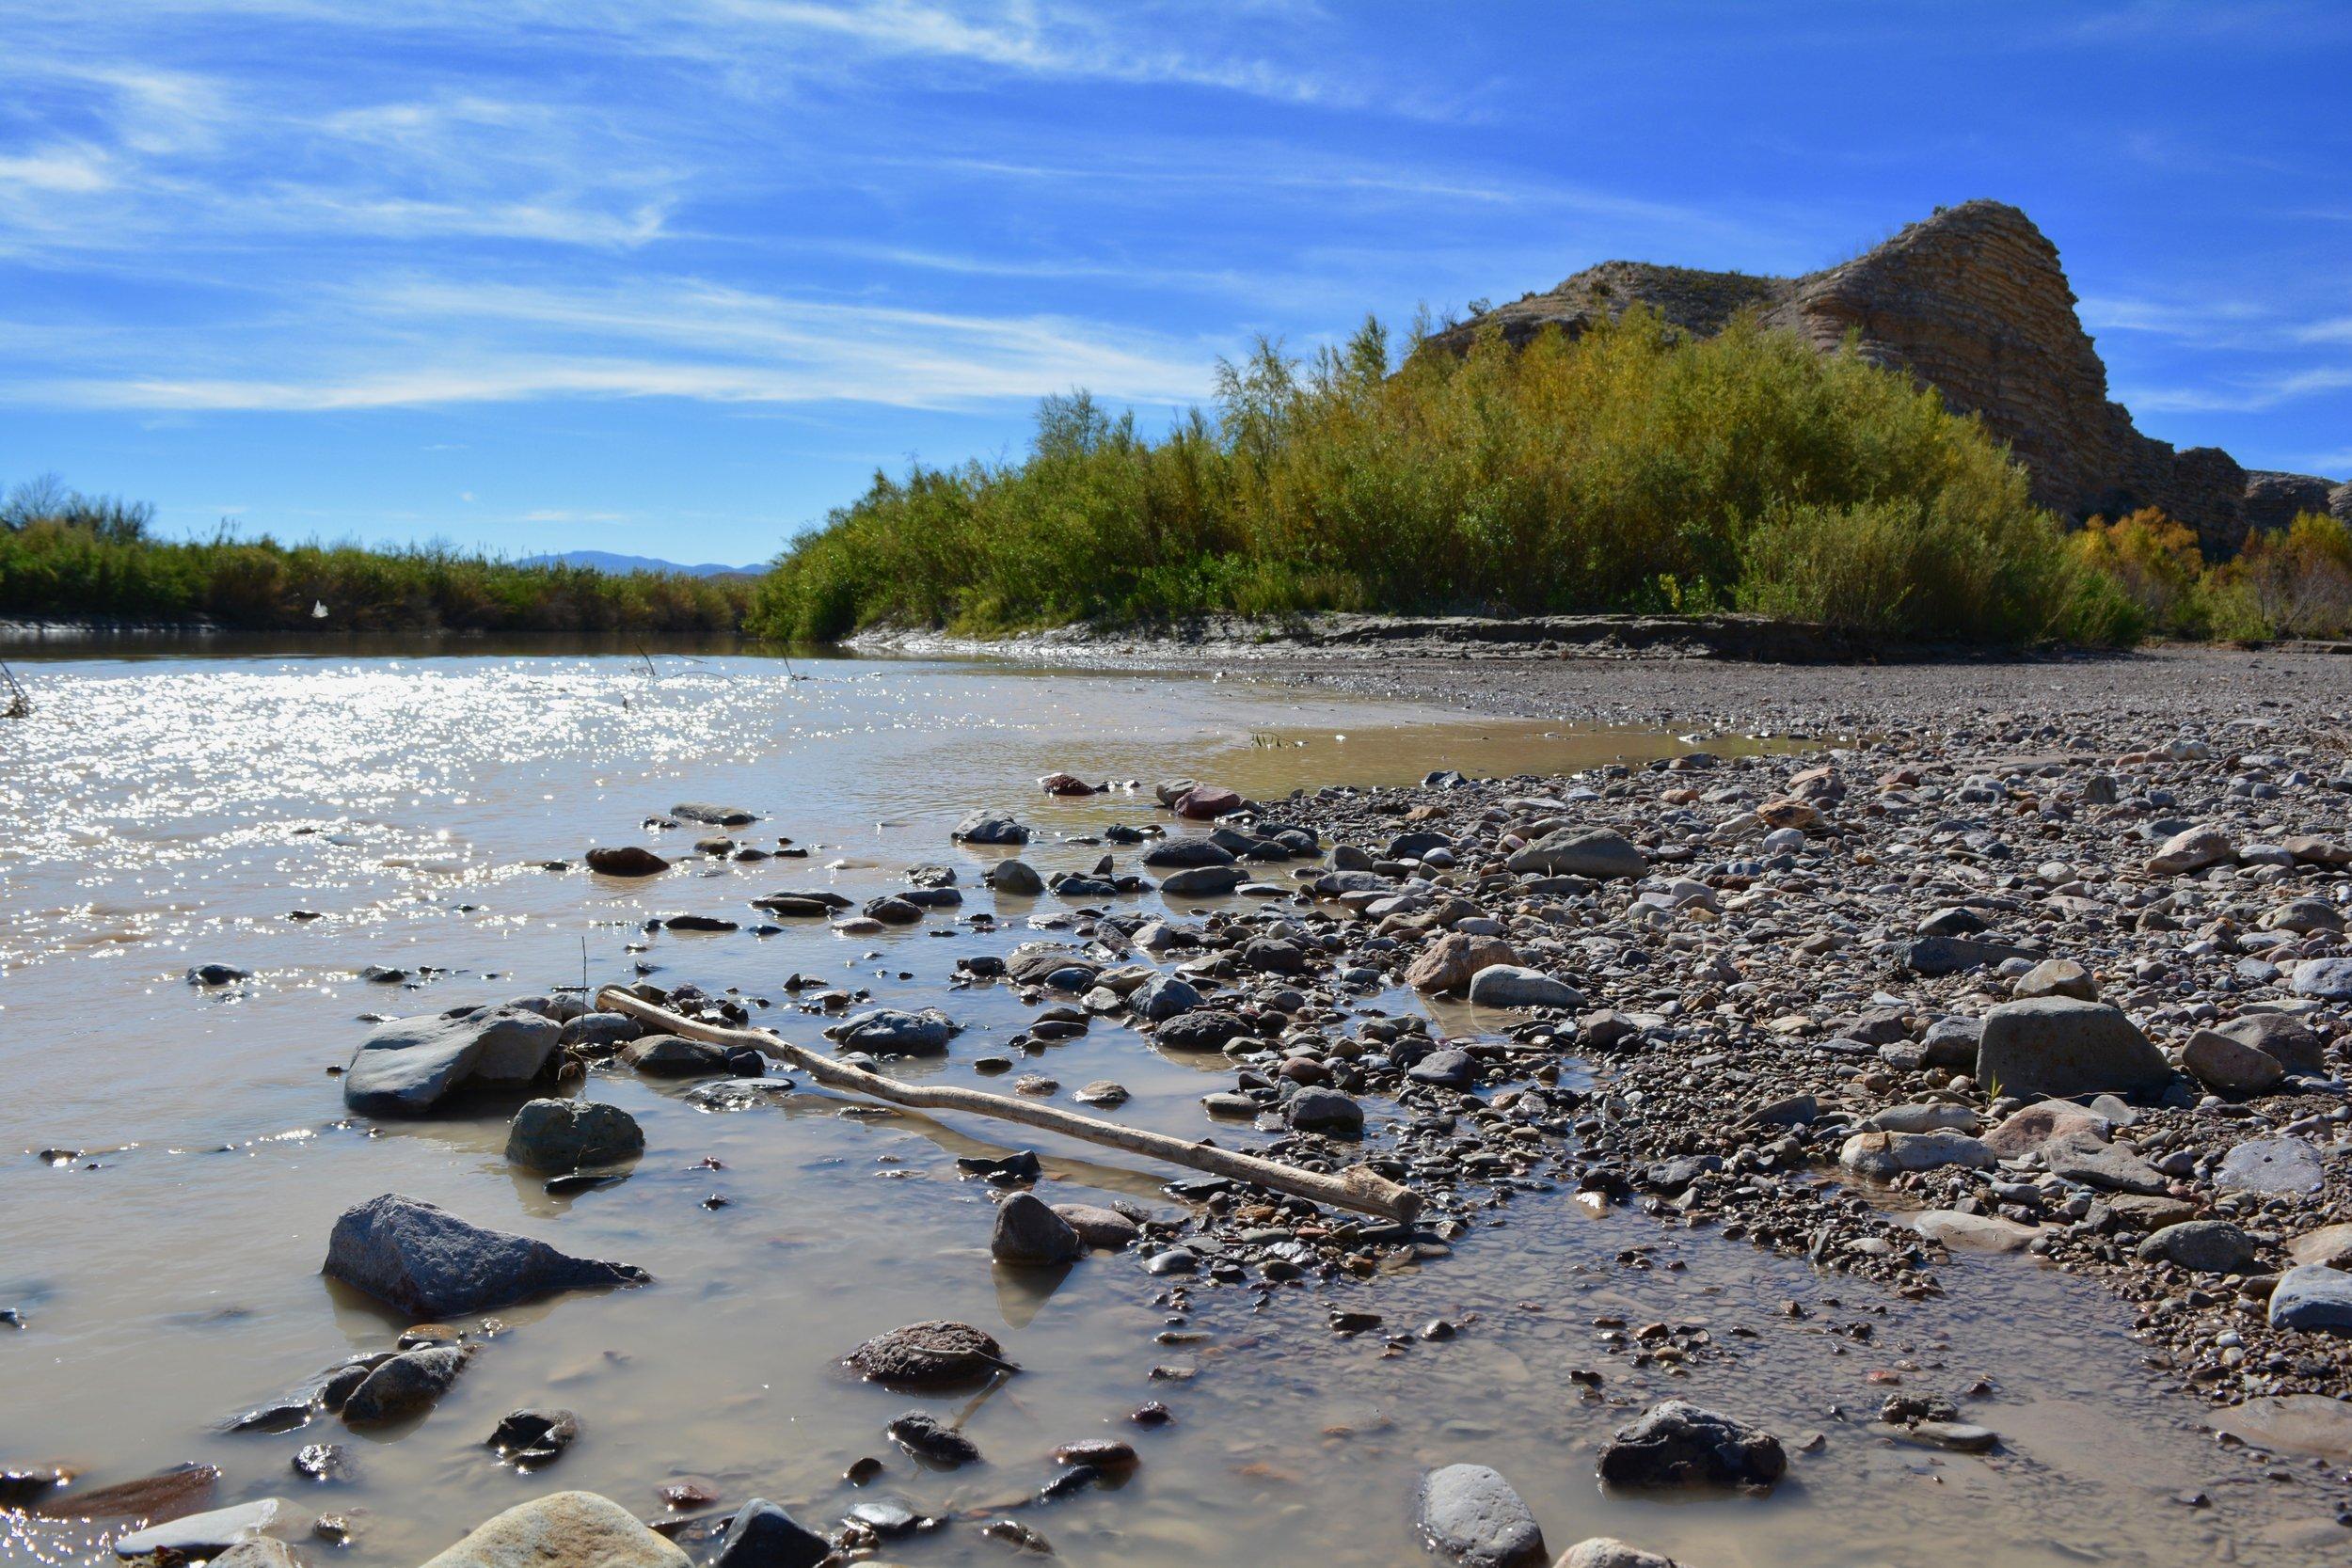 The Rio Grande River near Hot Springs